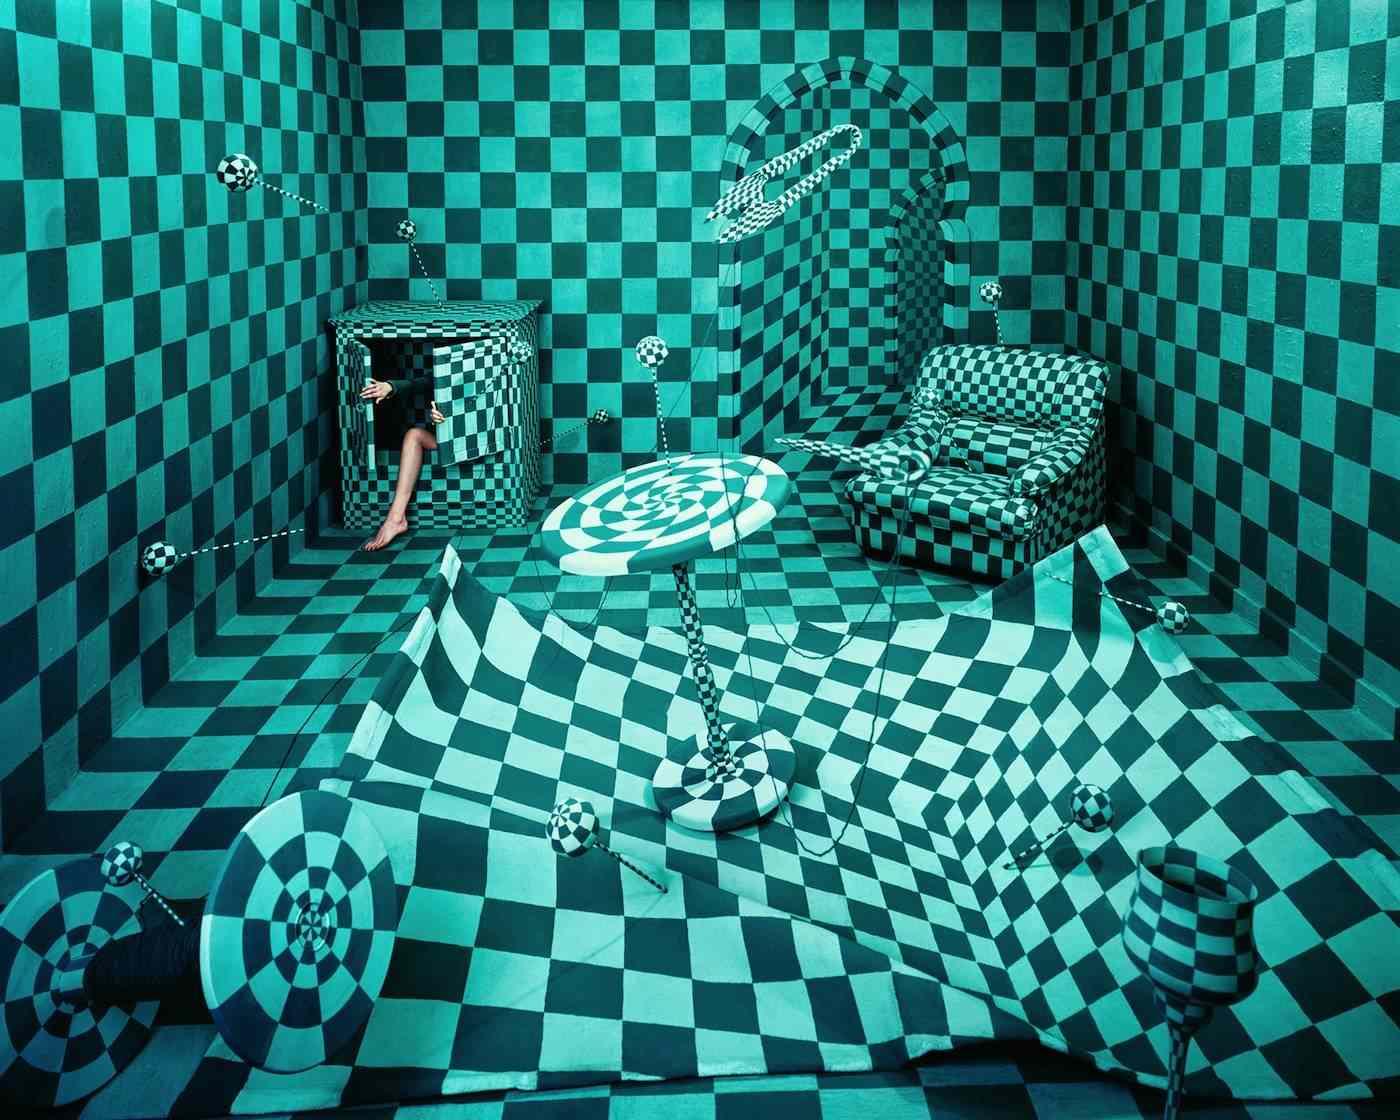 паническая комната фото фотография без фотошопа